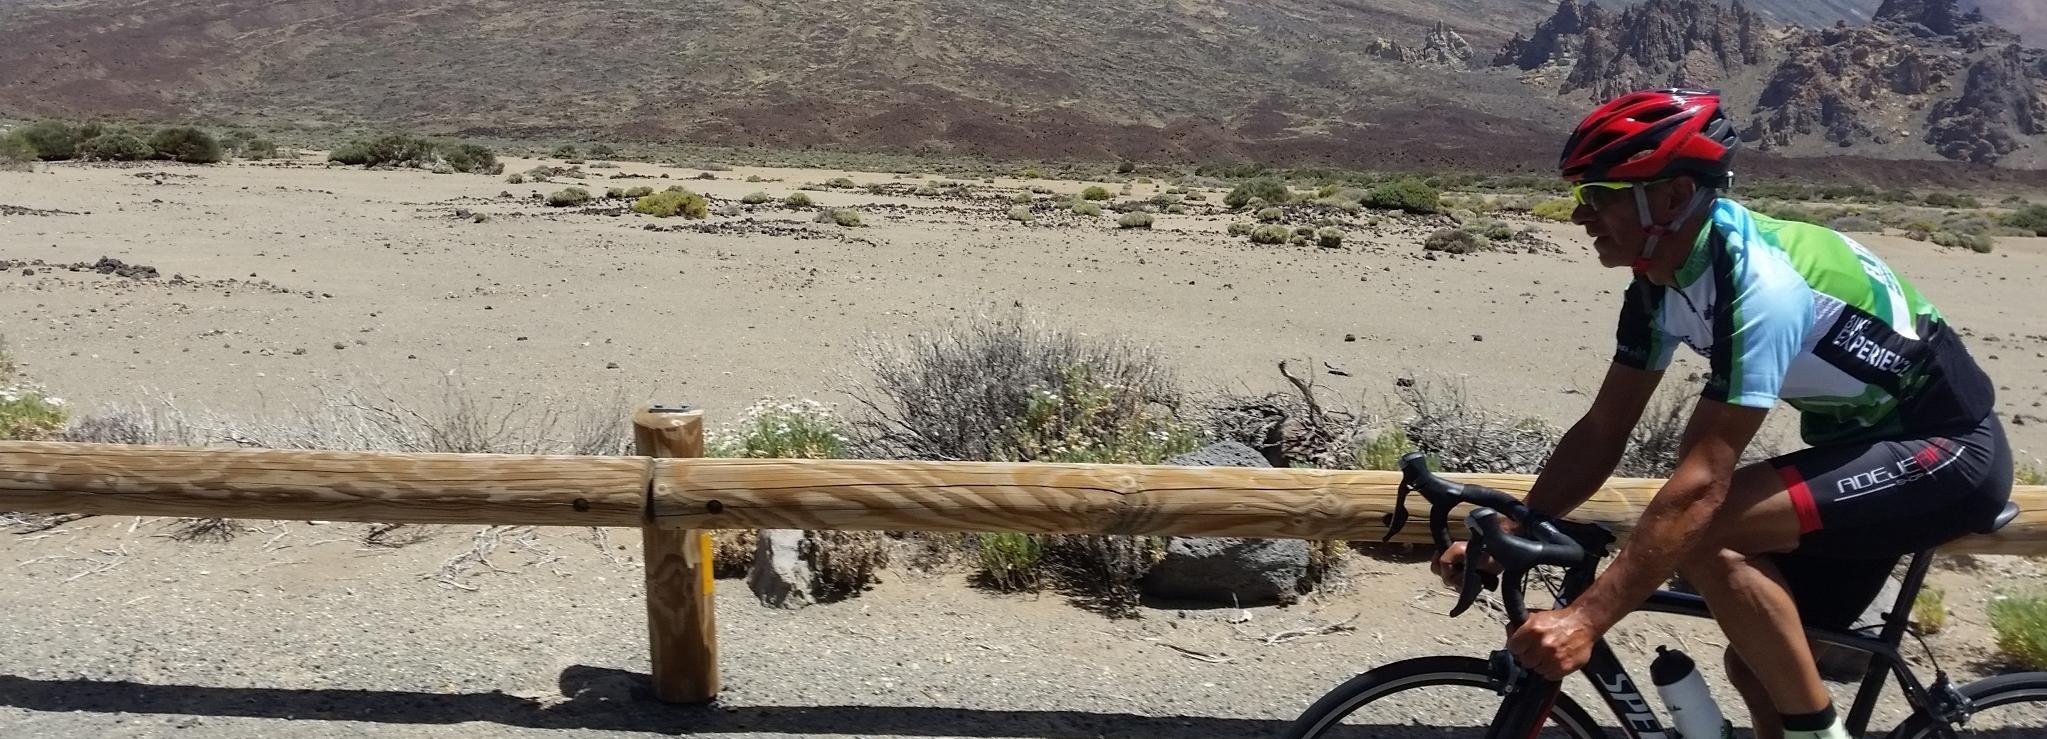 El Teide: Freitags ganztägiger Radweg